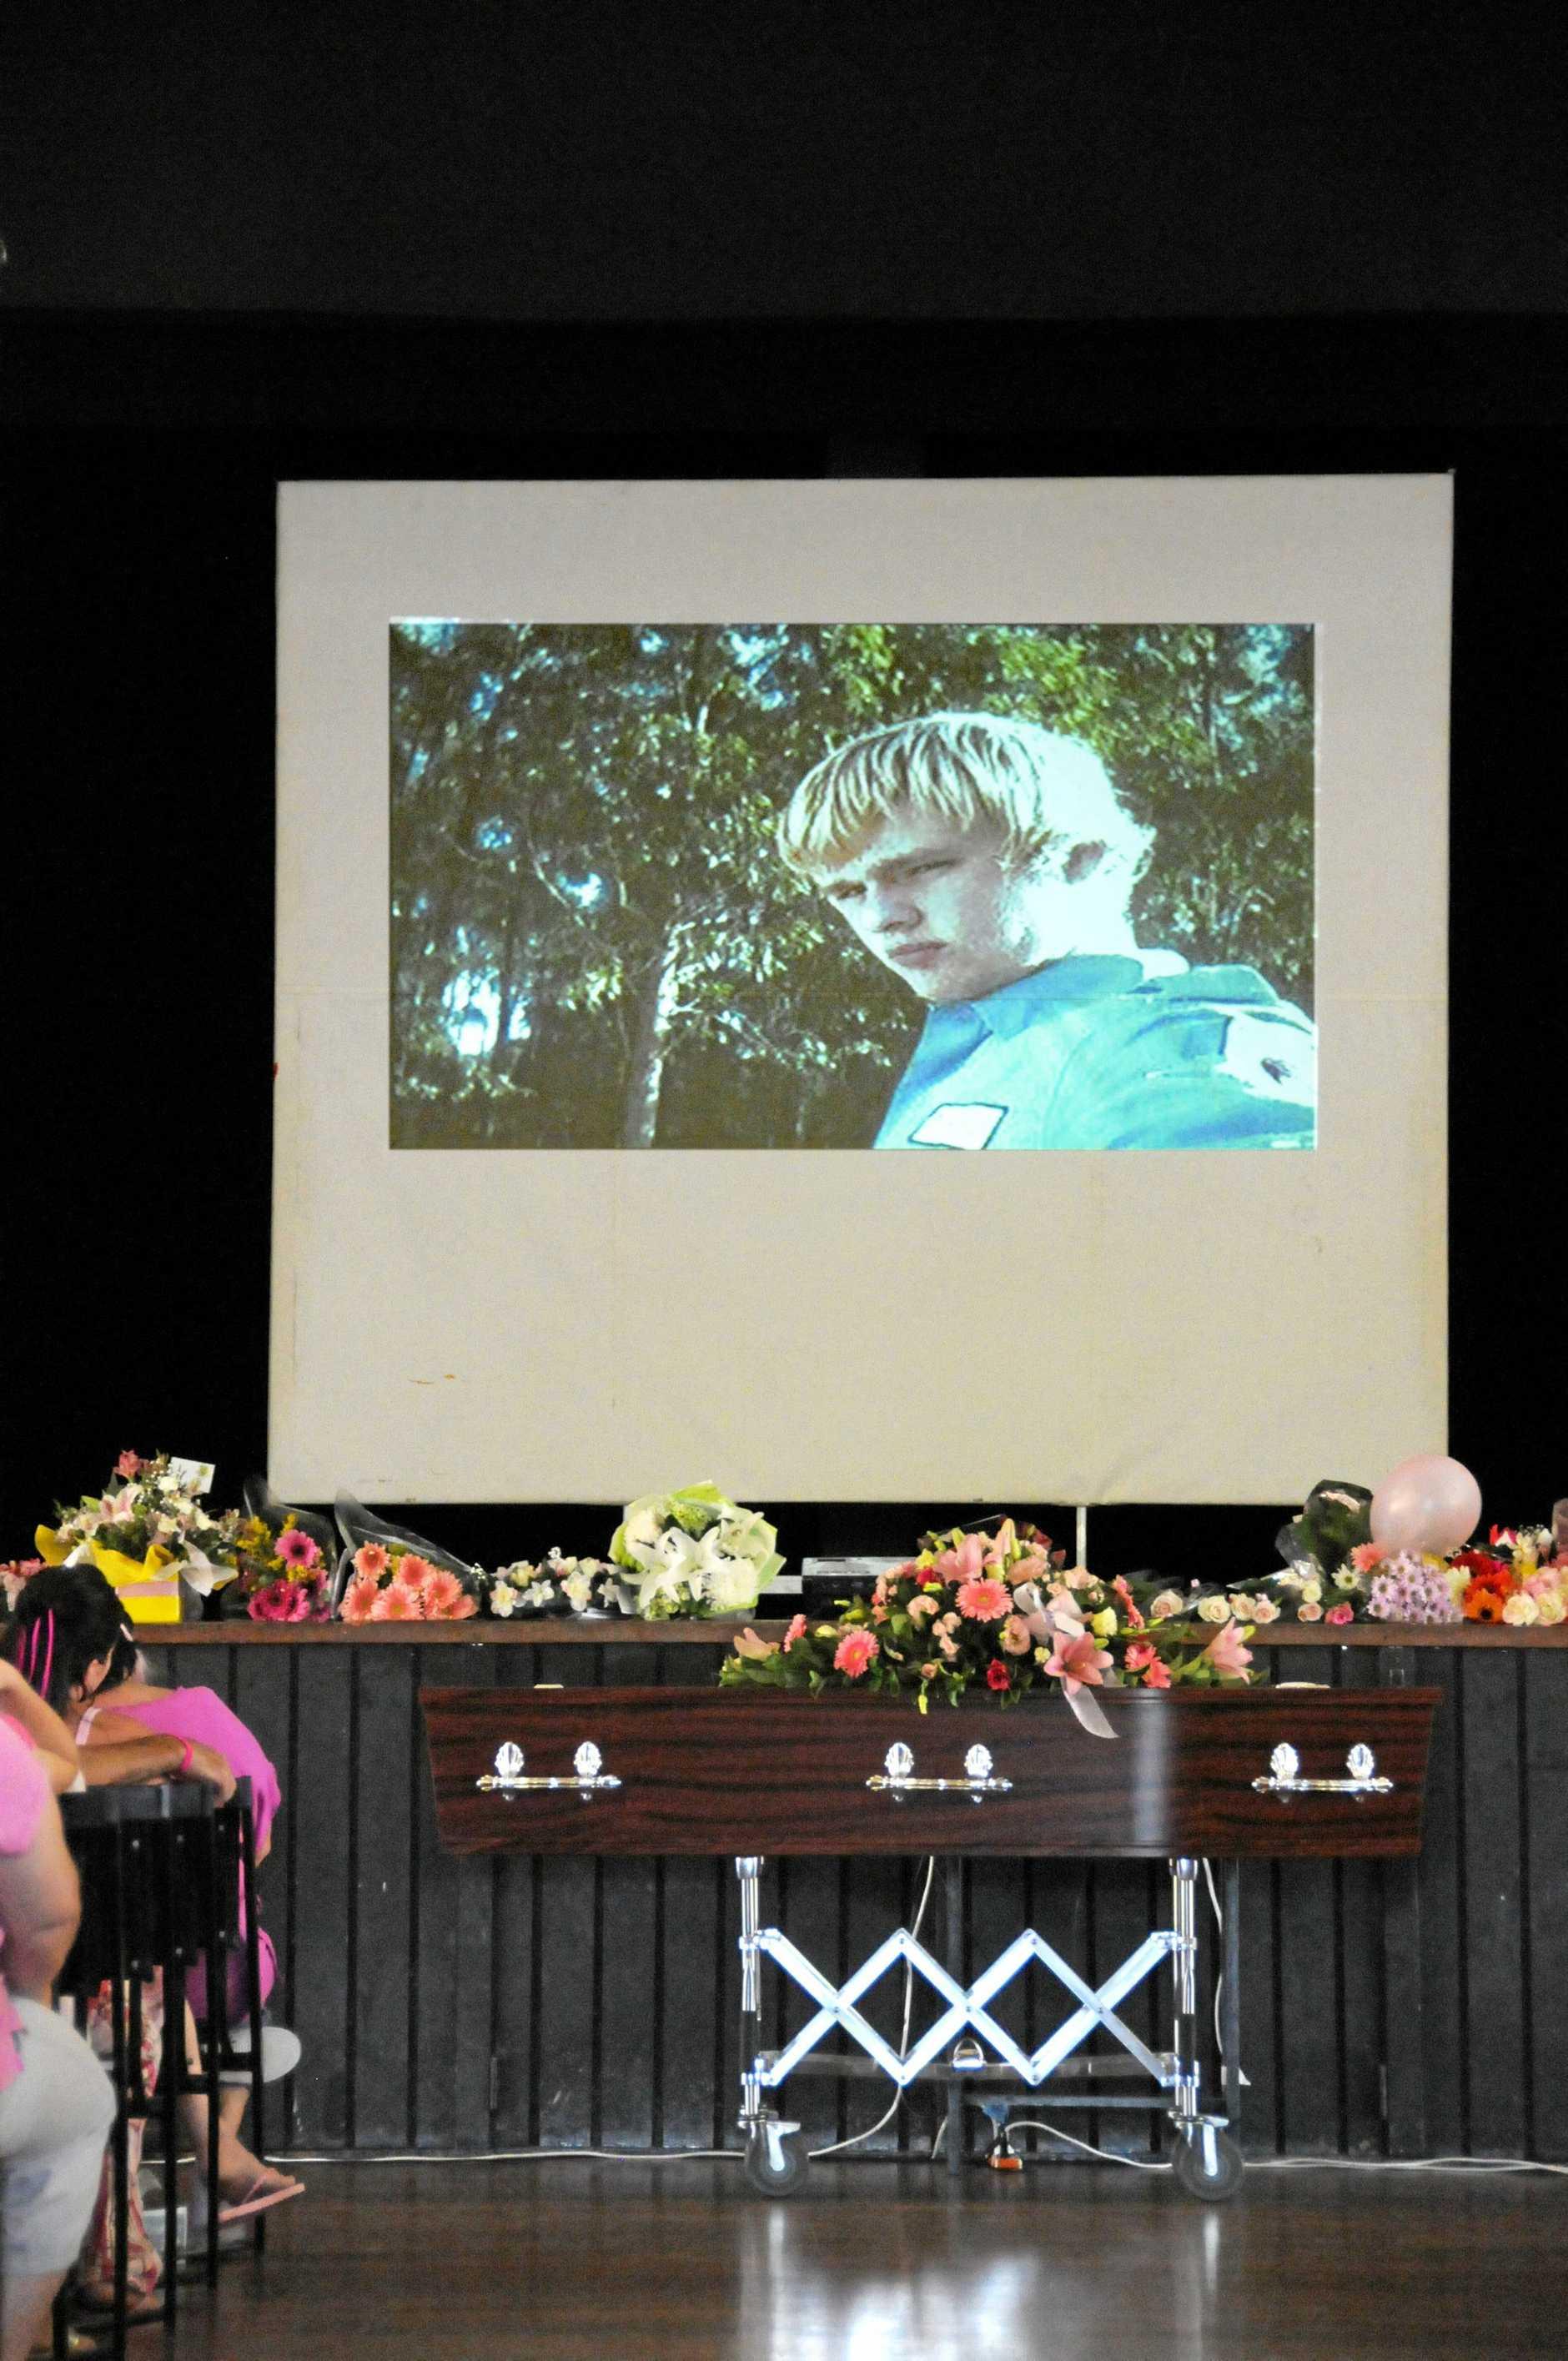 Jaxson Bradey's funeral